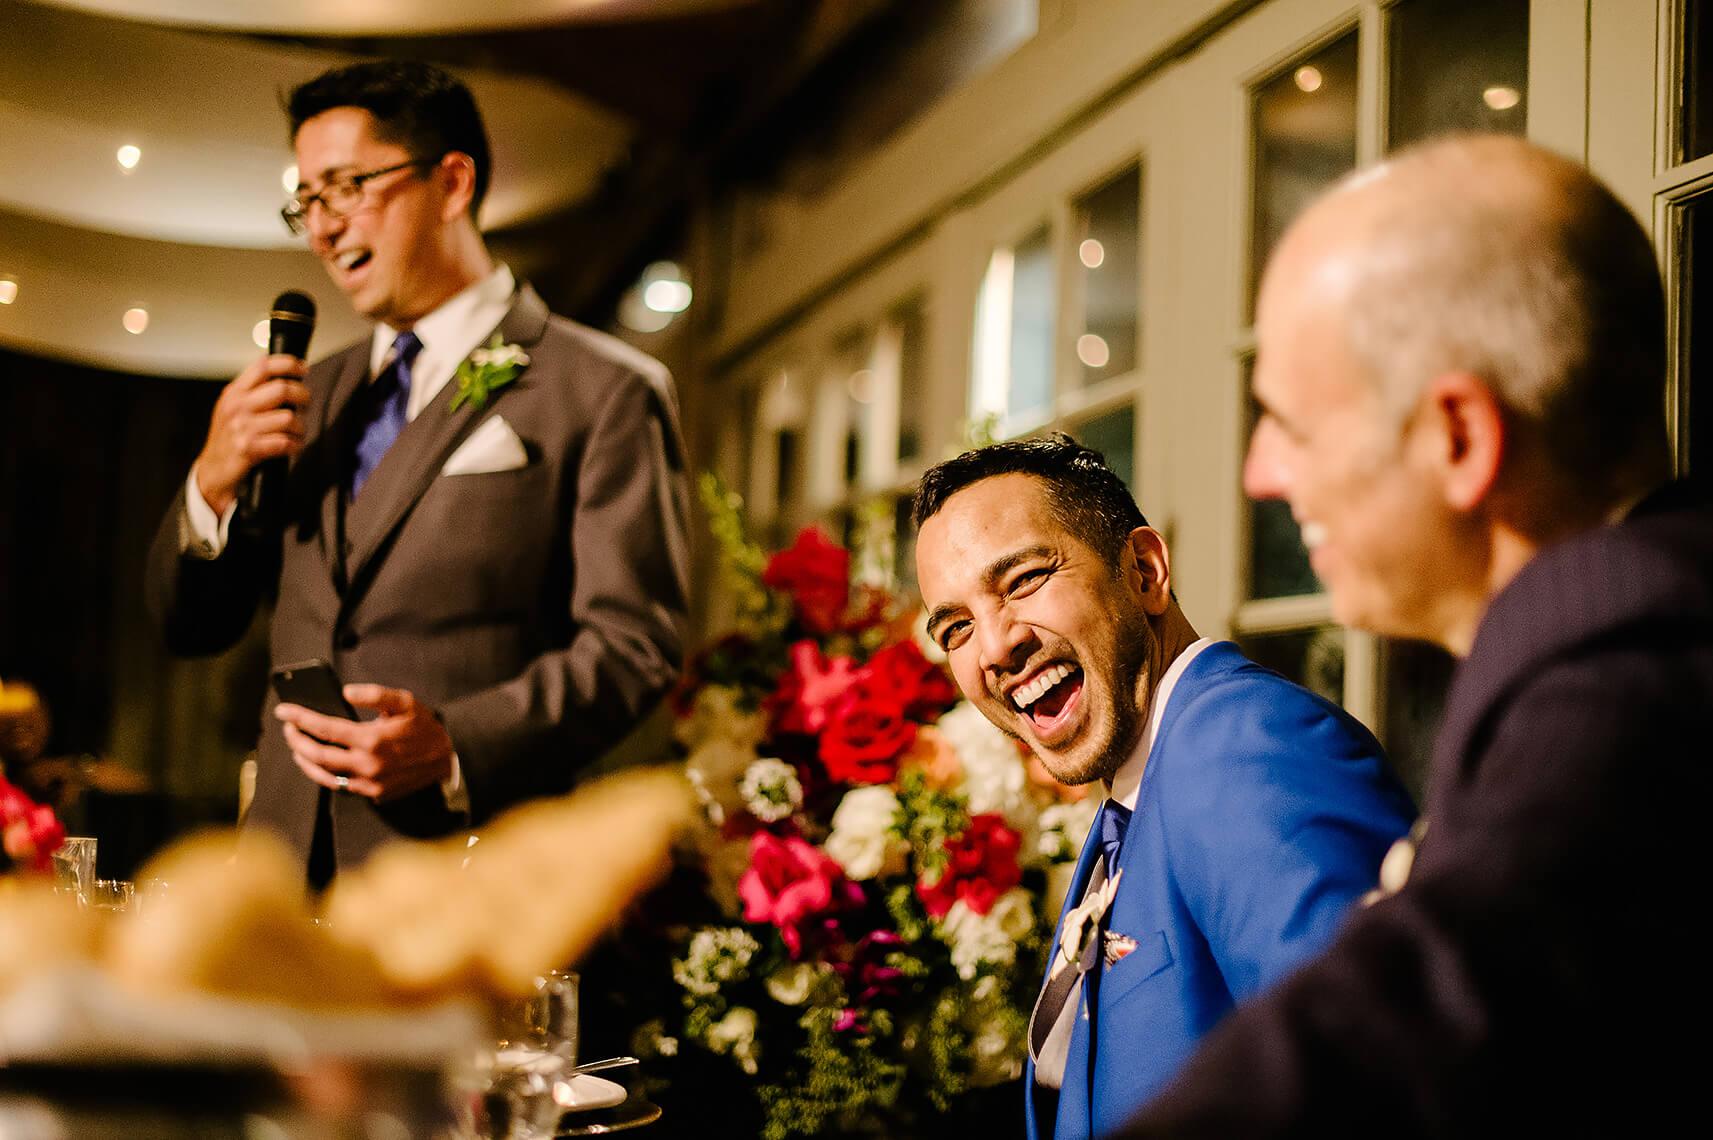 malibu-calamigos-ranch-same-sex-wedding-photographer-los-angeles-32.jpg